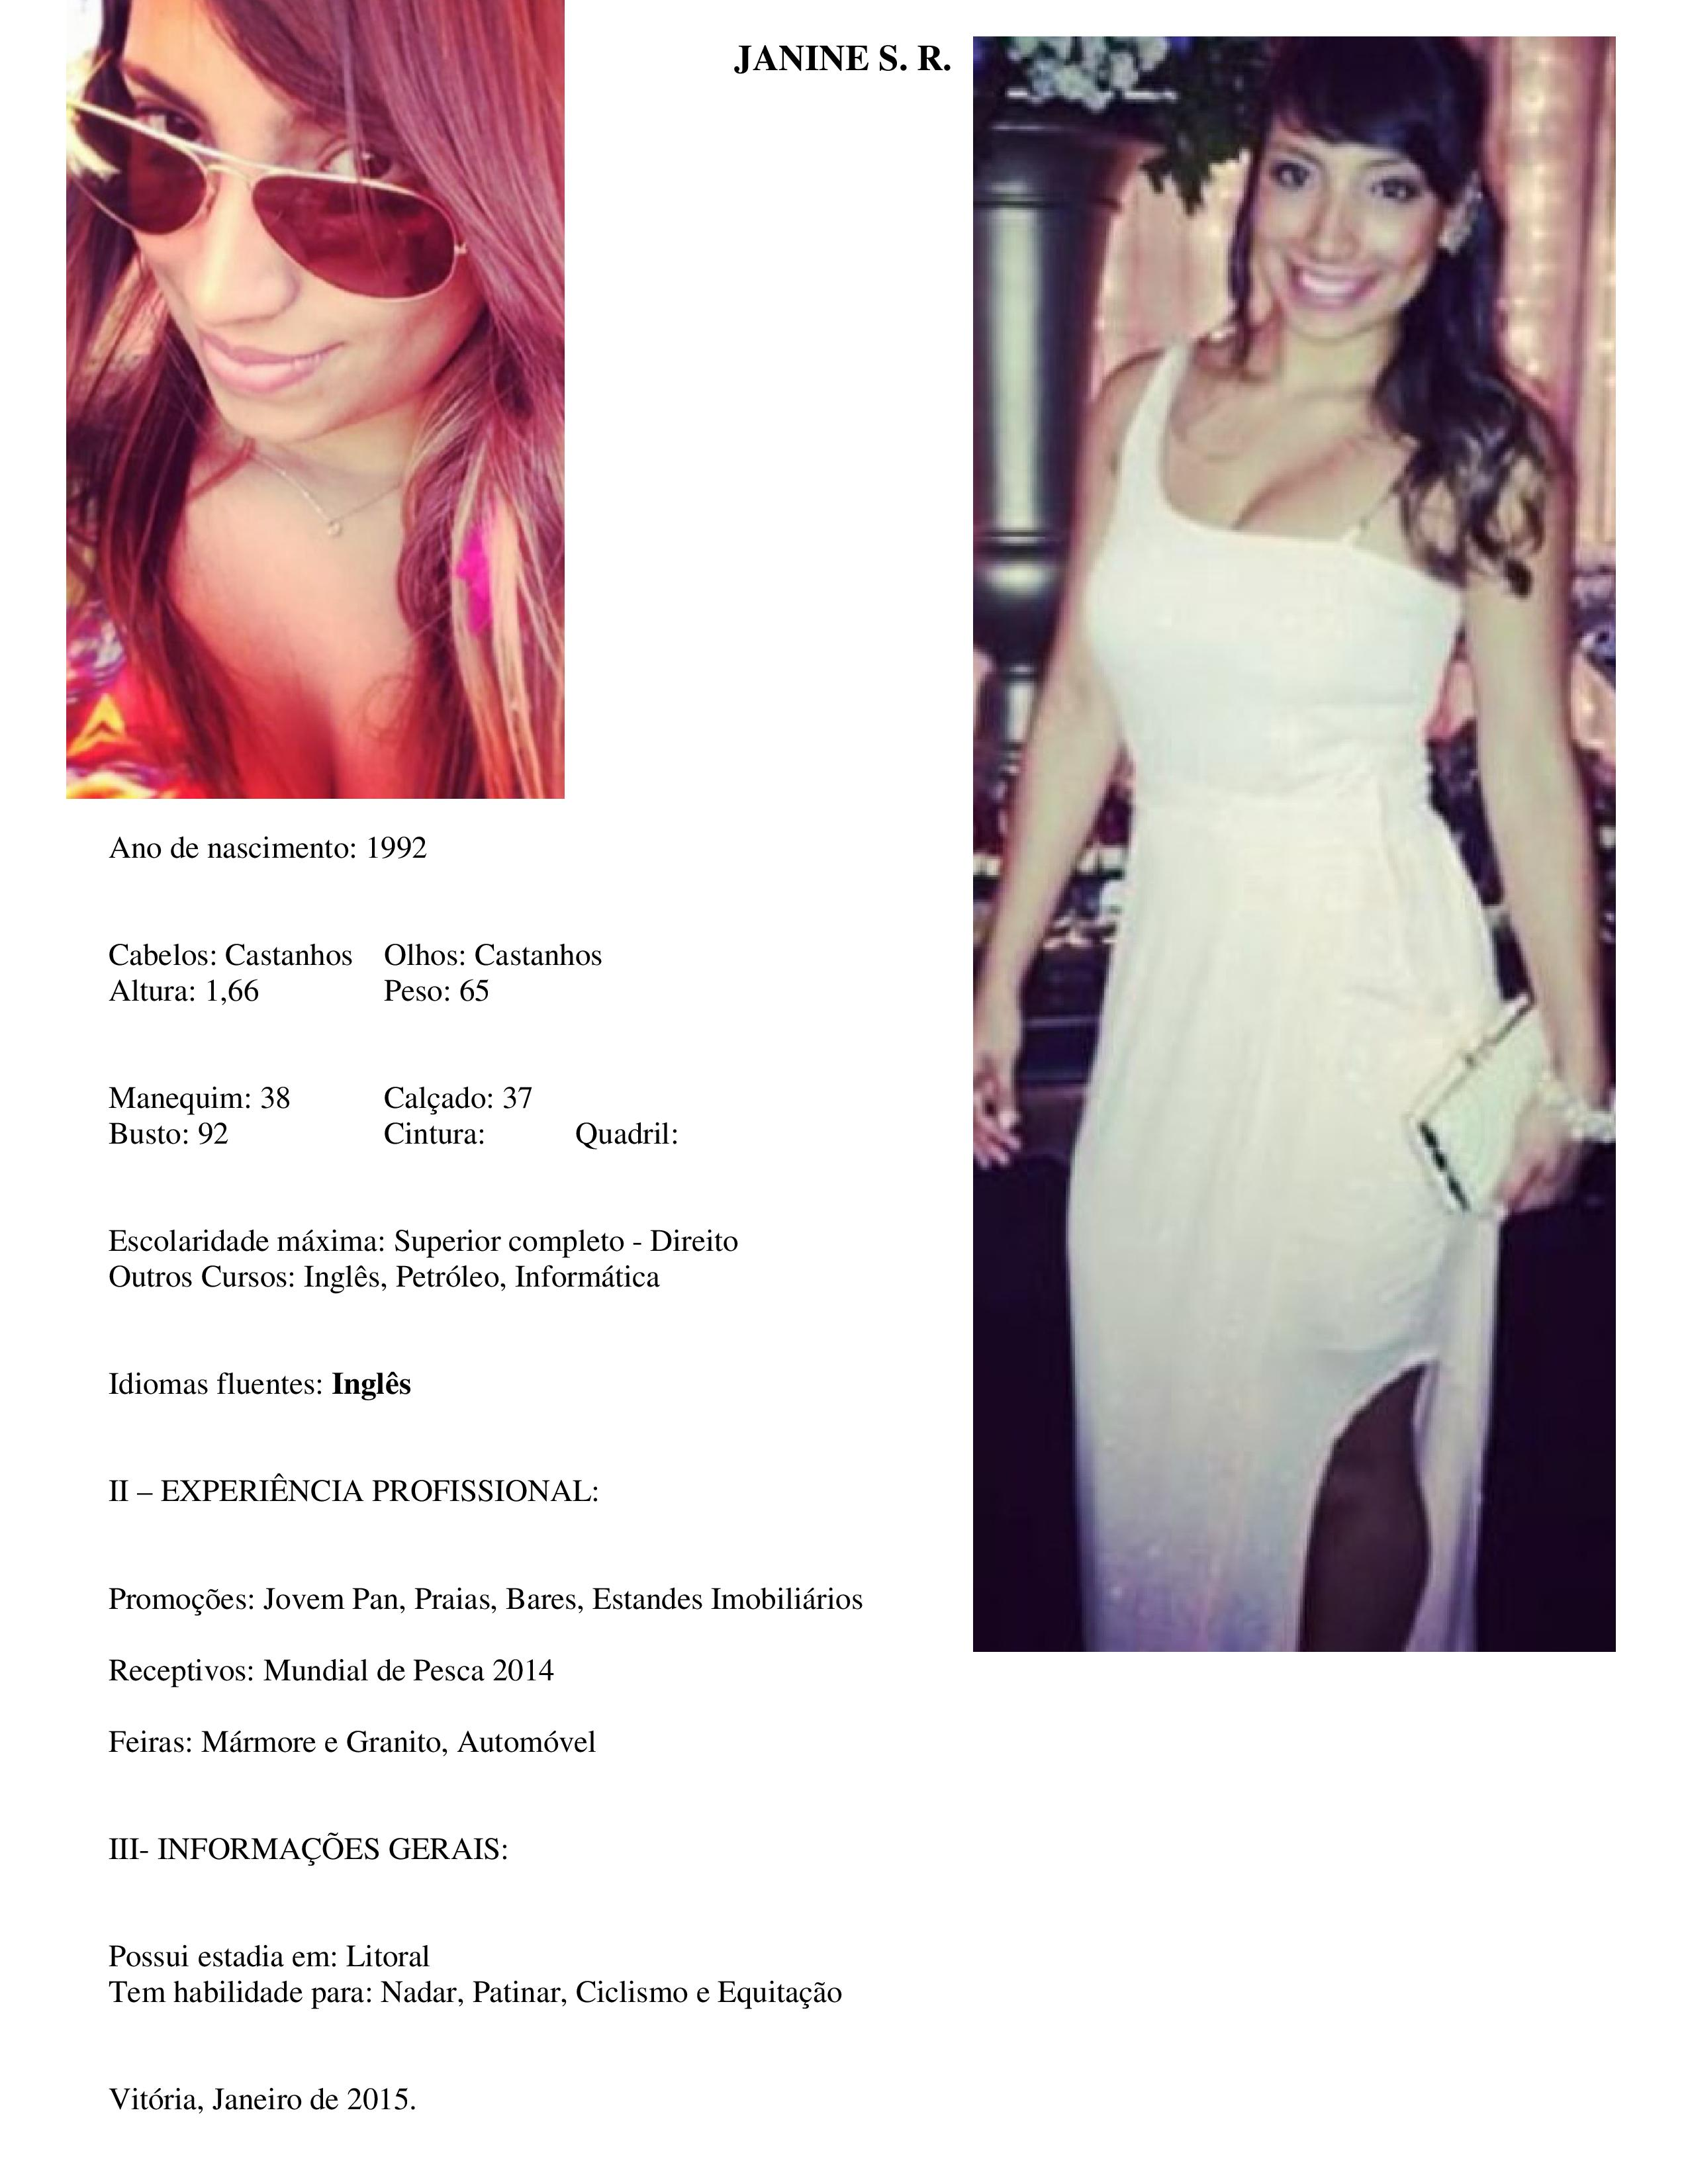 Janine-page-001